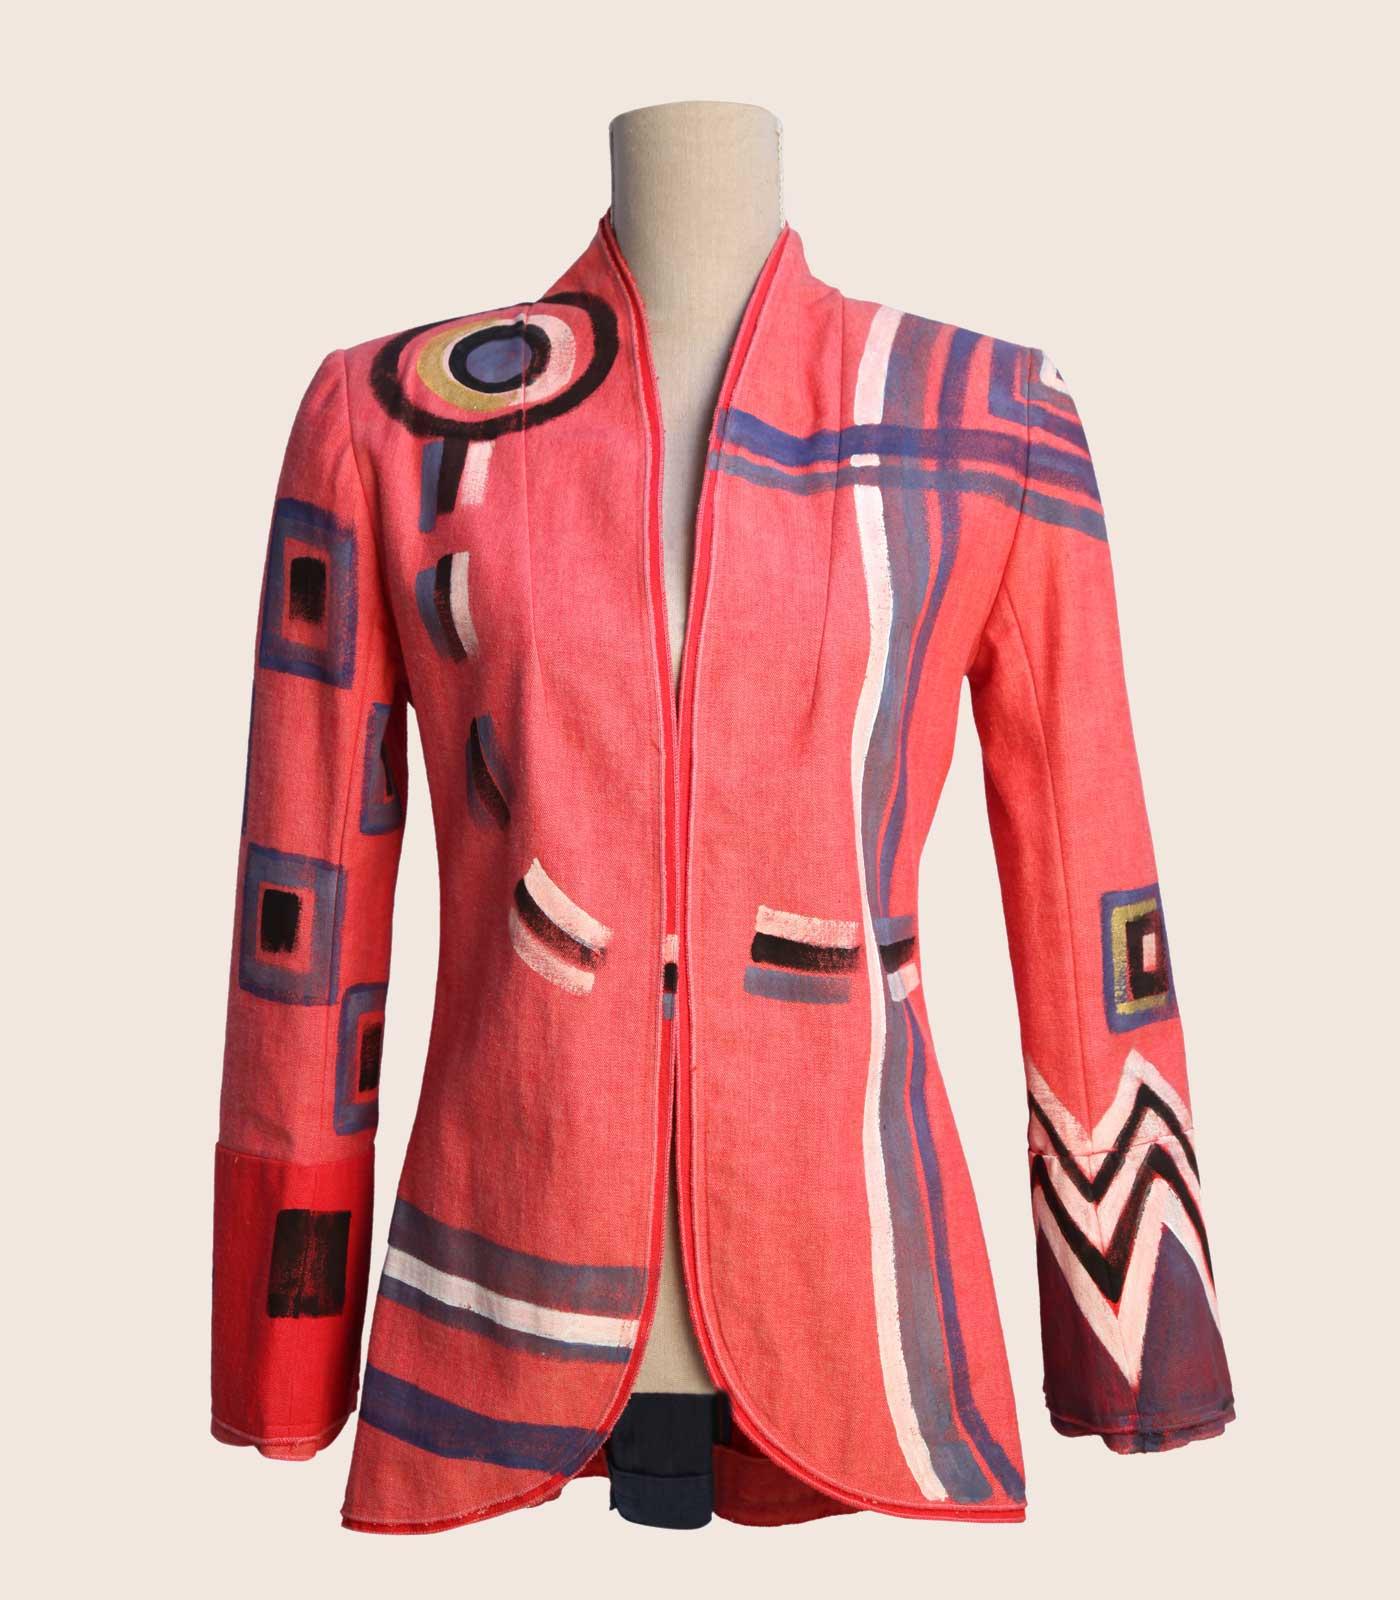 detailed look 272c0 a24a8 Giacca rosa elegante in cotone denim - Fashion Art ...